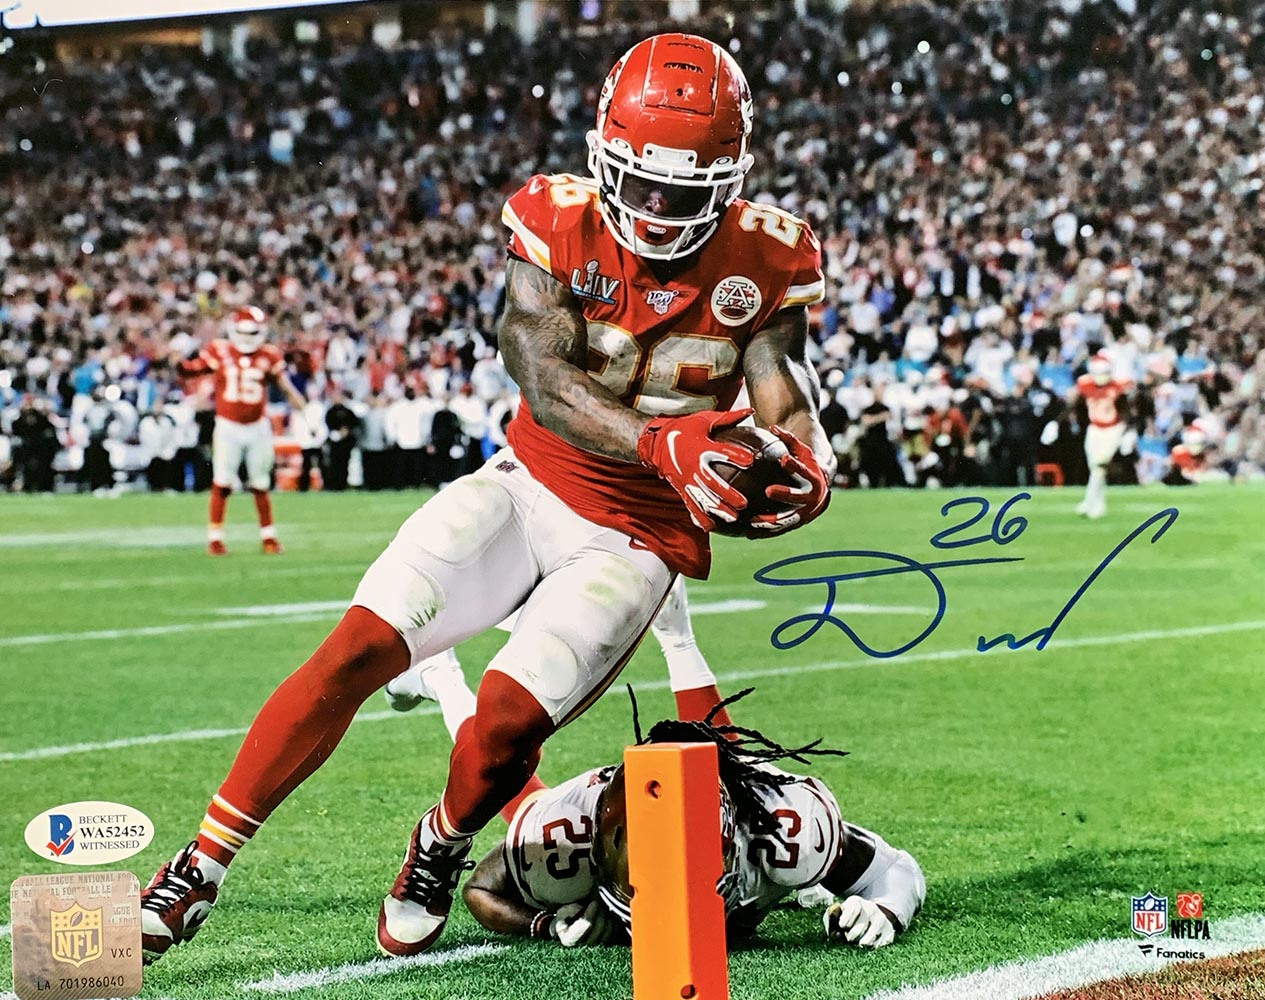 Damien Williams Super Bowl 54 Kansas City Chiefs Signed 8x10 Photo BAS